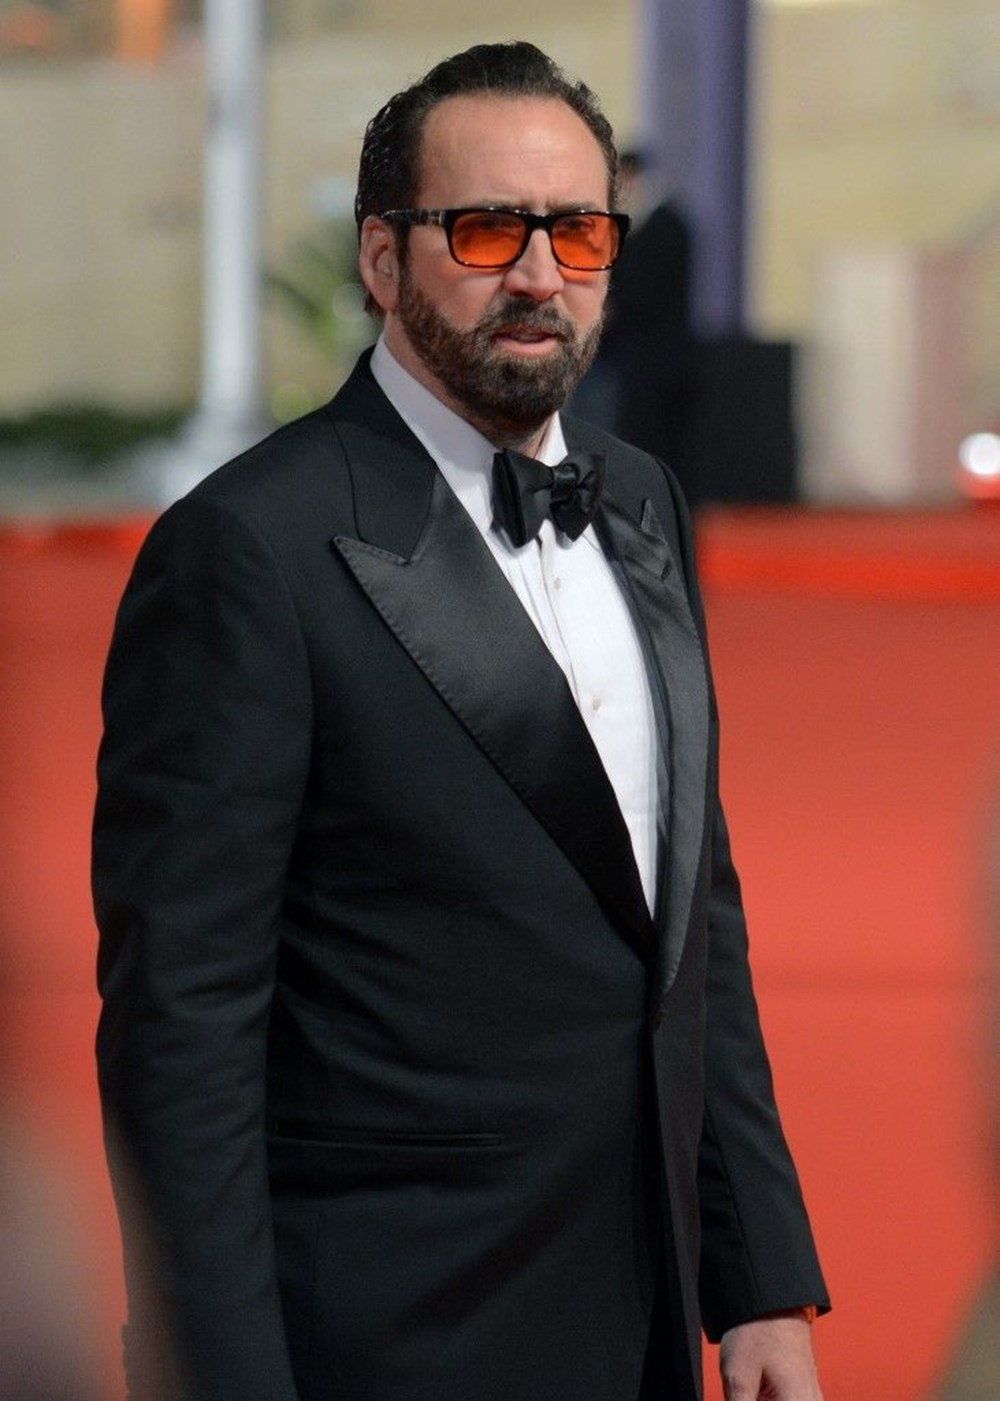 117 filme imza atan Nicolas Cage: Asla emekli olmayacağım - 2